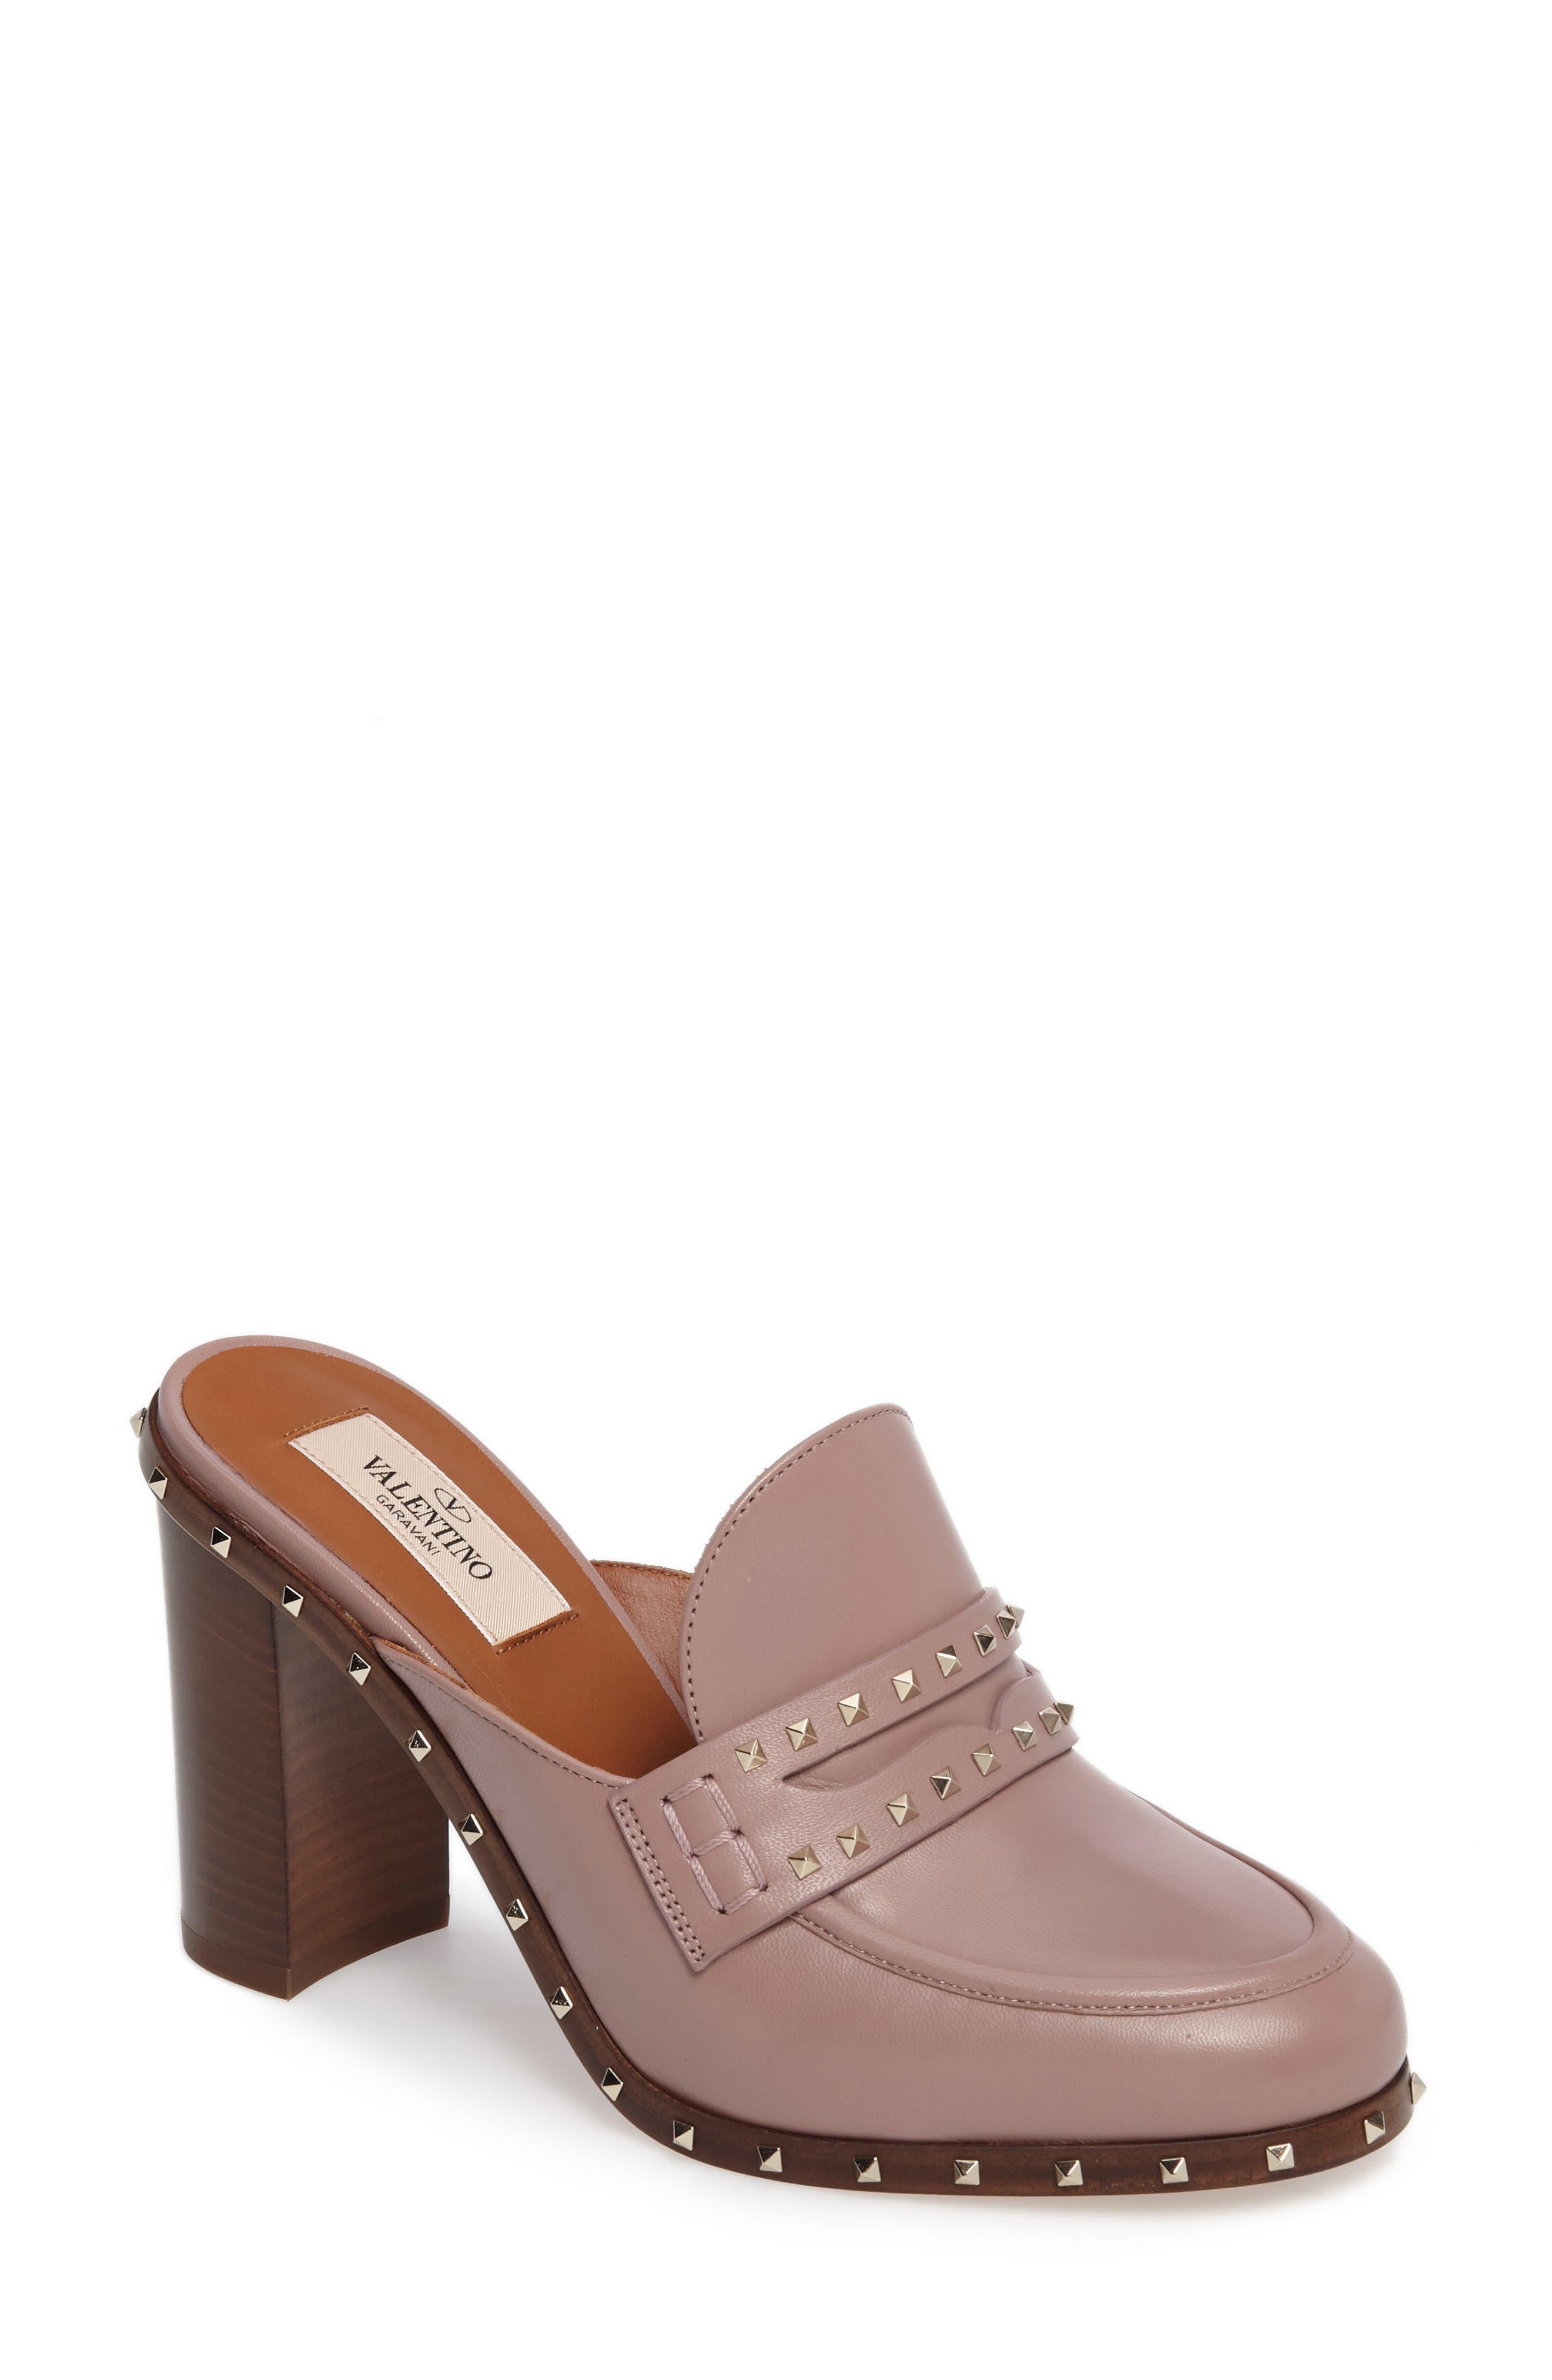 Rockstud Loafer Mule,                         Main,                         color, Pink Leather